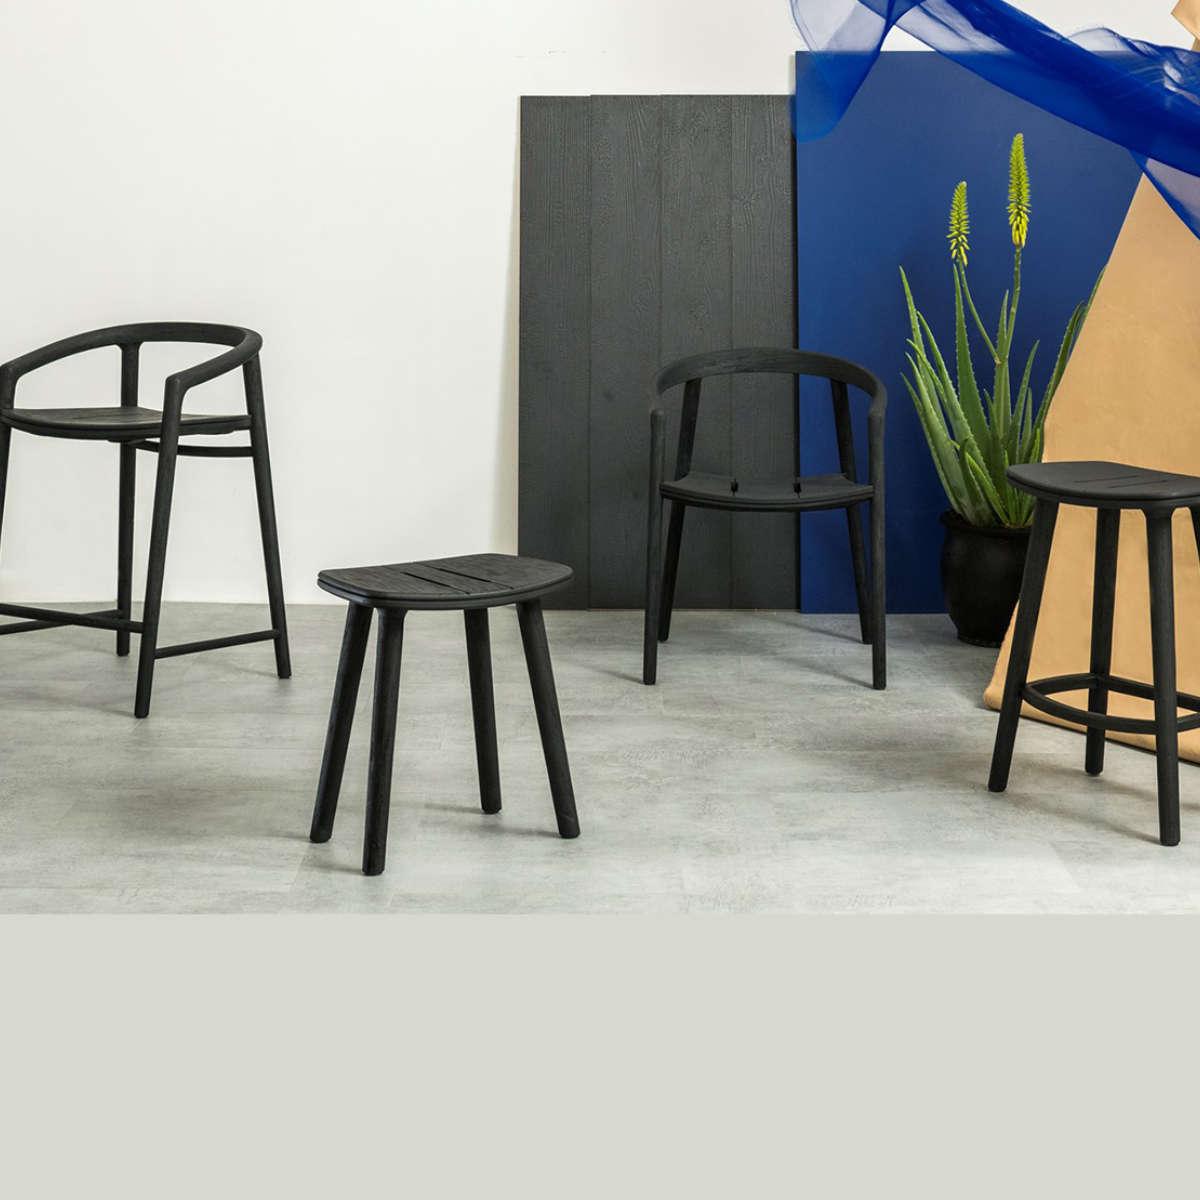 Modern Garden Co Solid Barstools